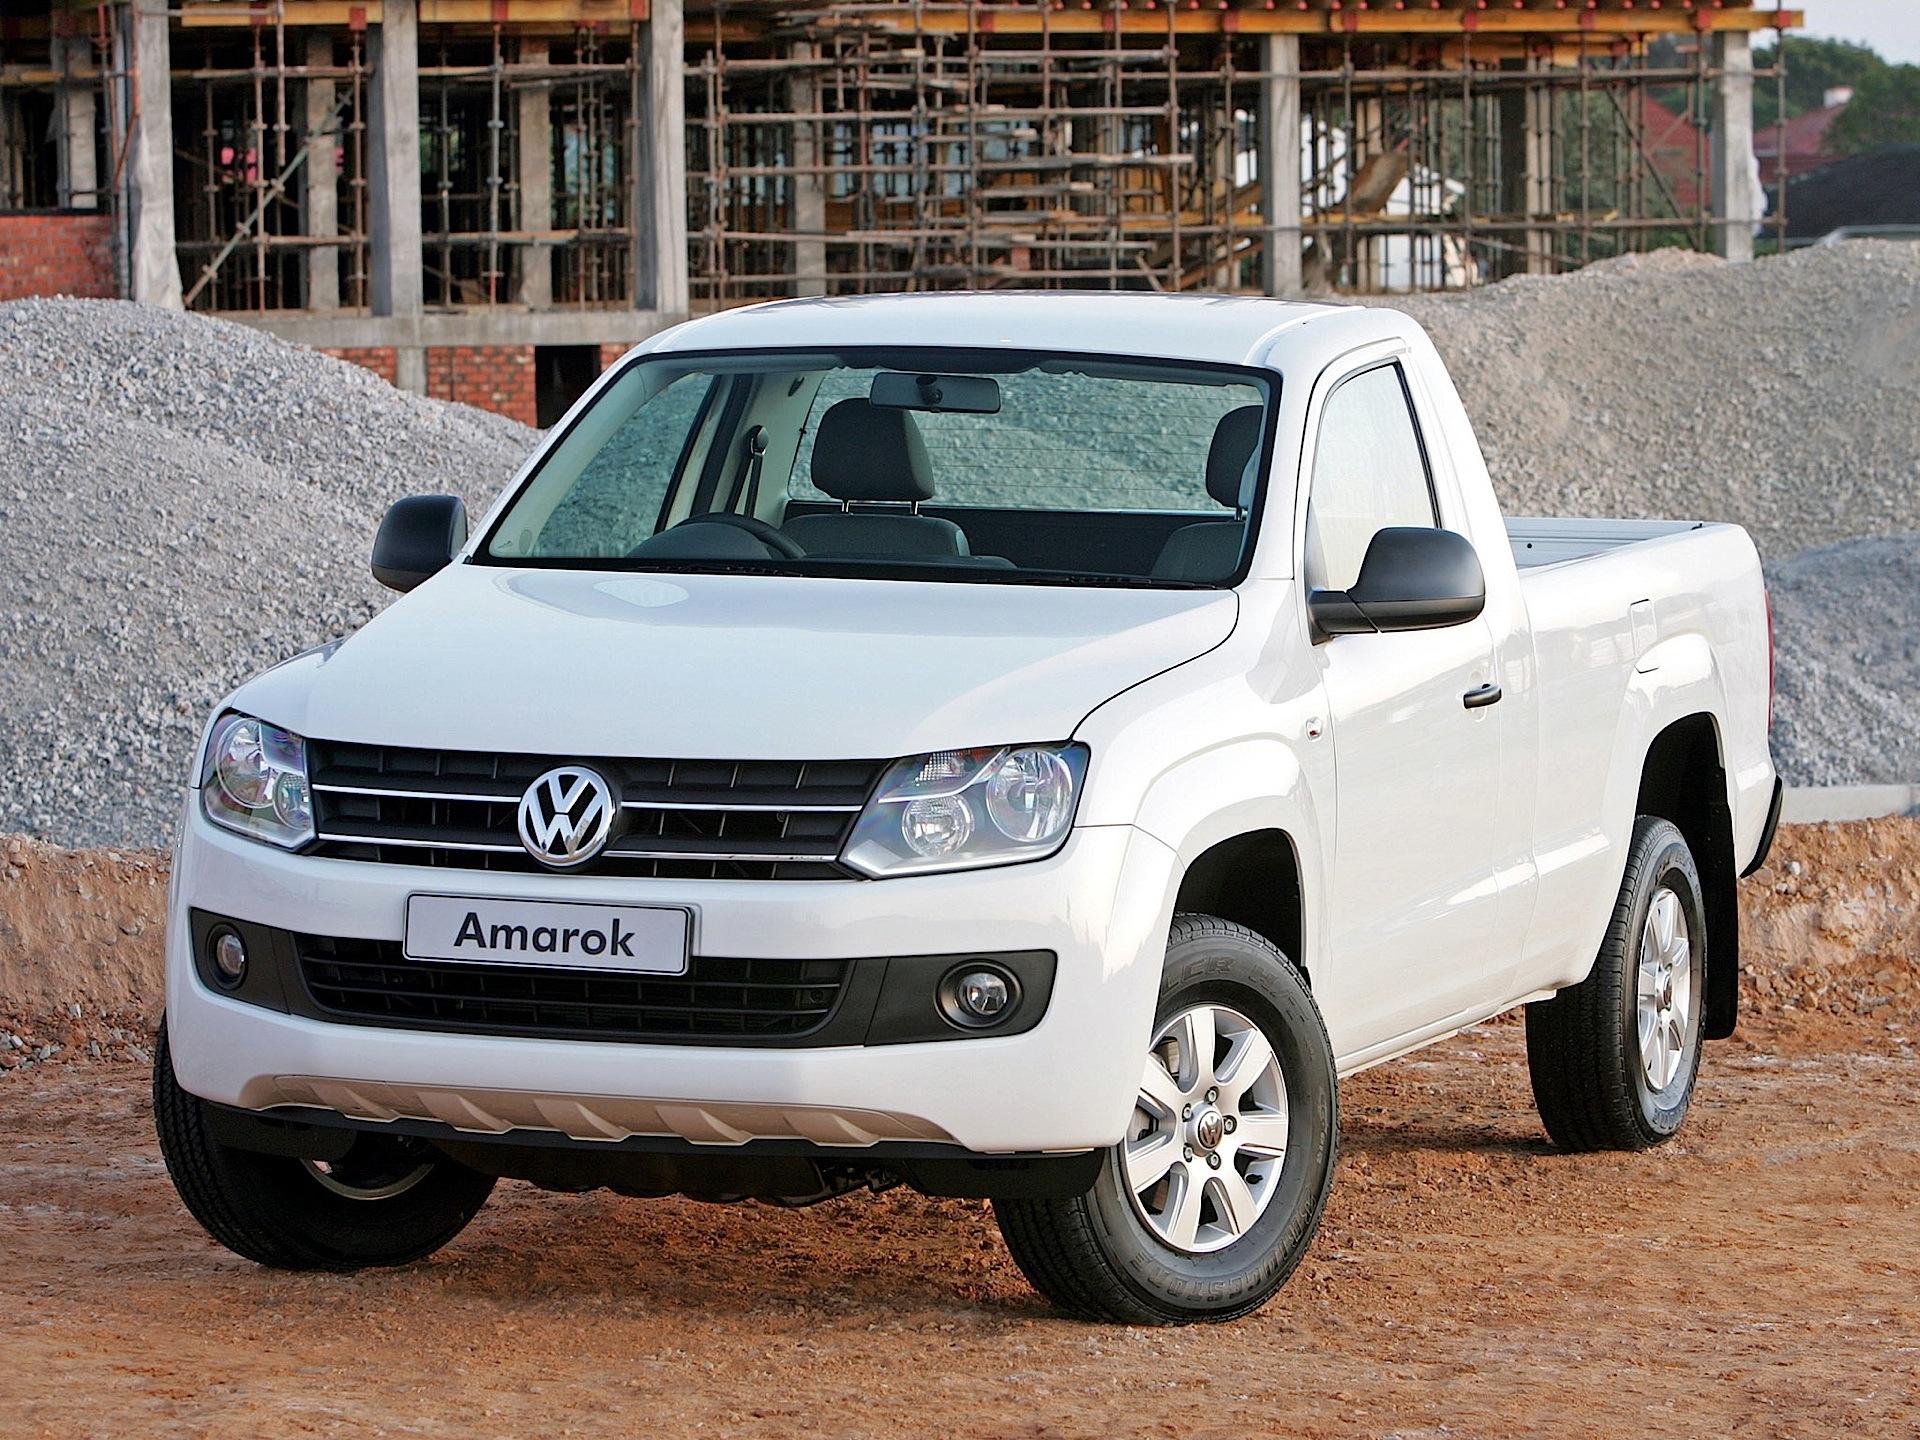 Volkswagen Amarok I 2010 - 2016 Pickup #1